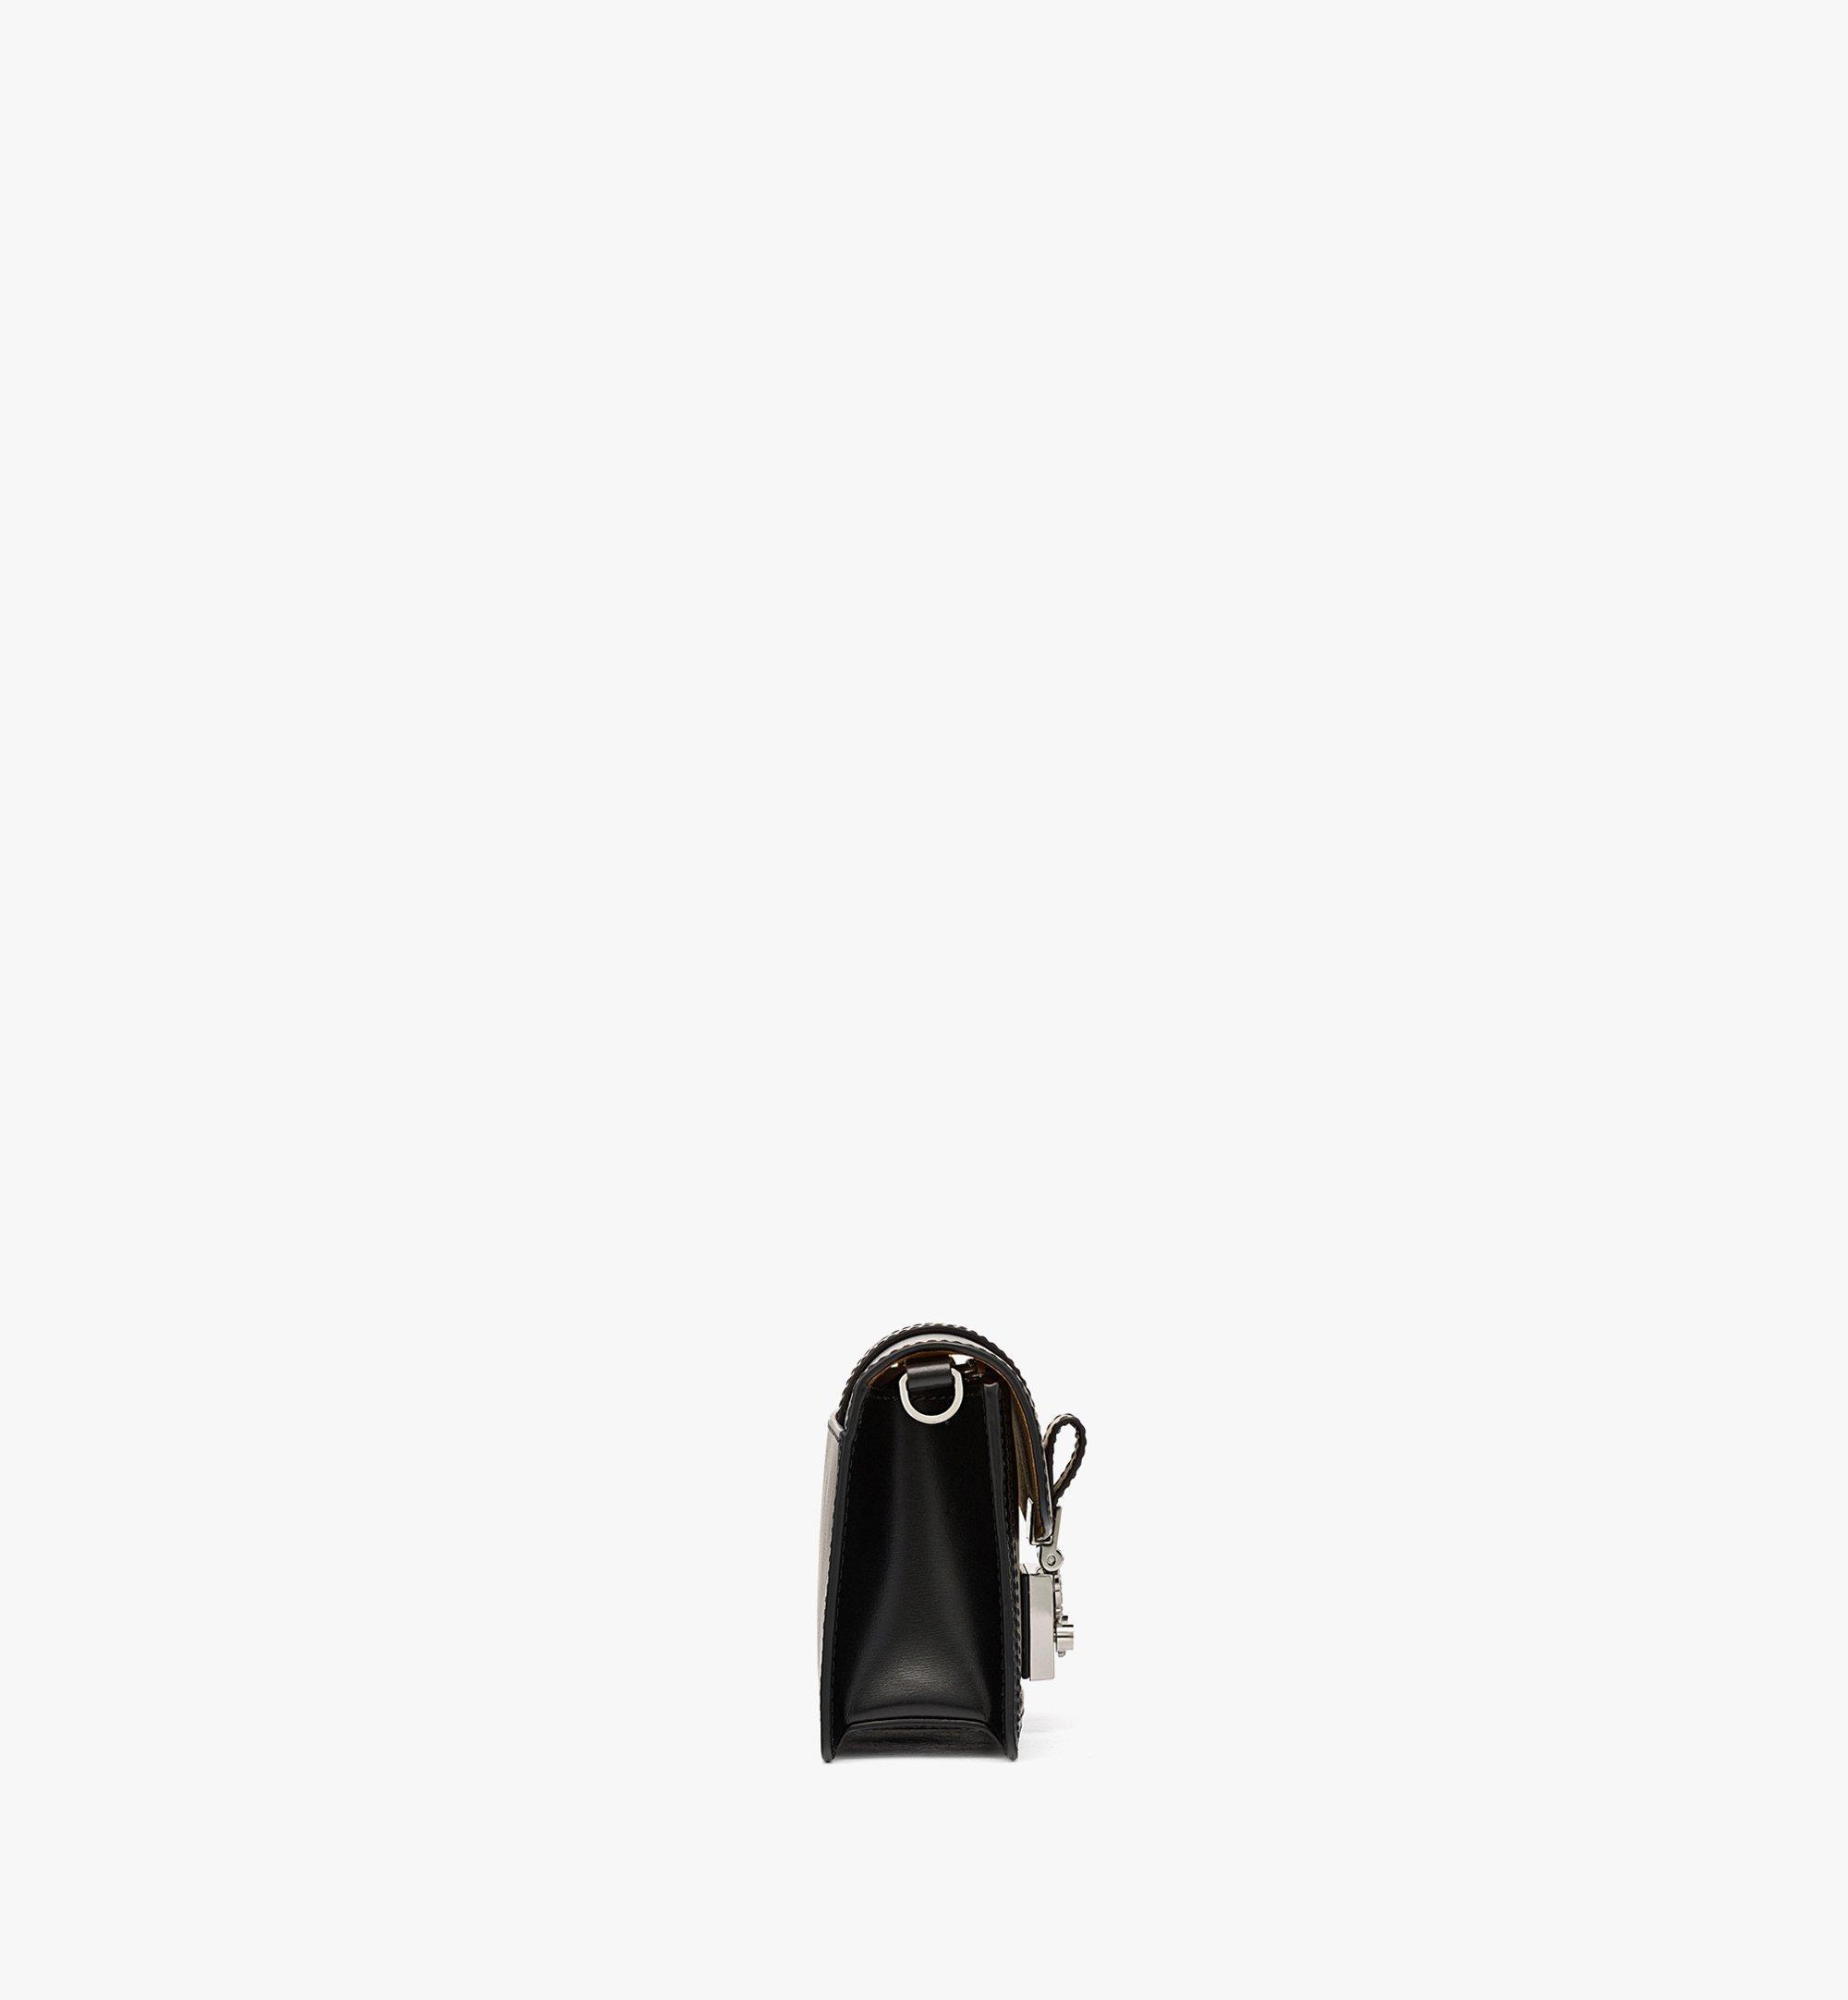 MCM Gretl Crossbody in Spanish Leather Black MWRBAWO03BK001 Alternate View 1